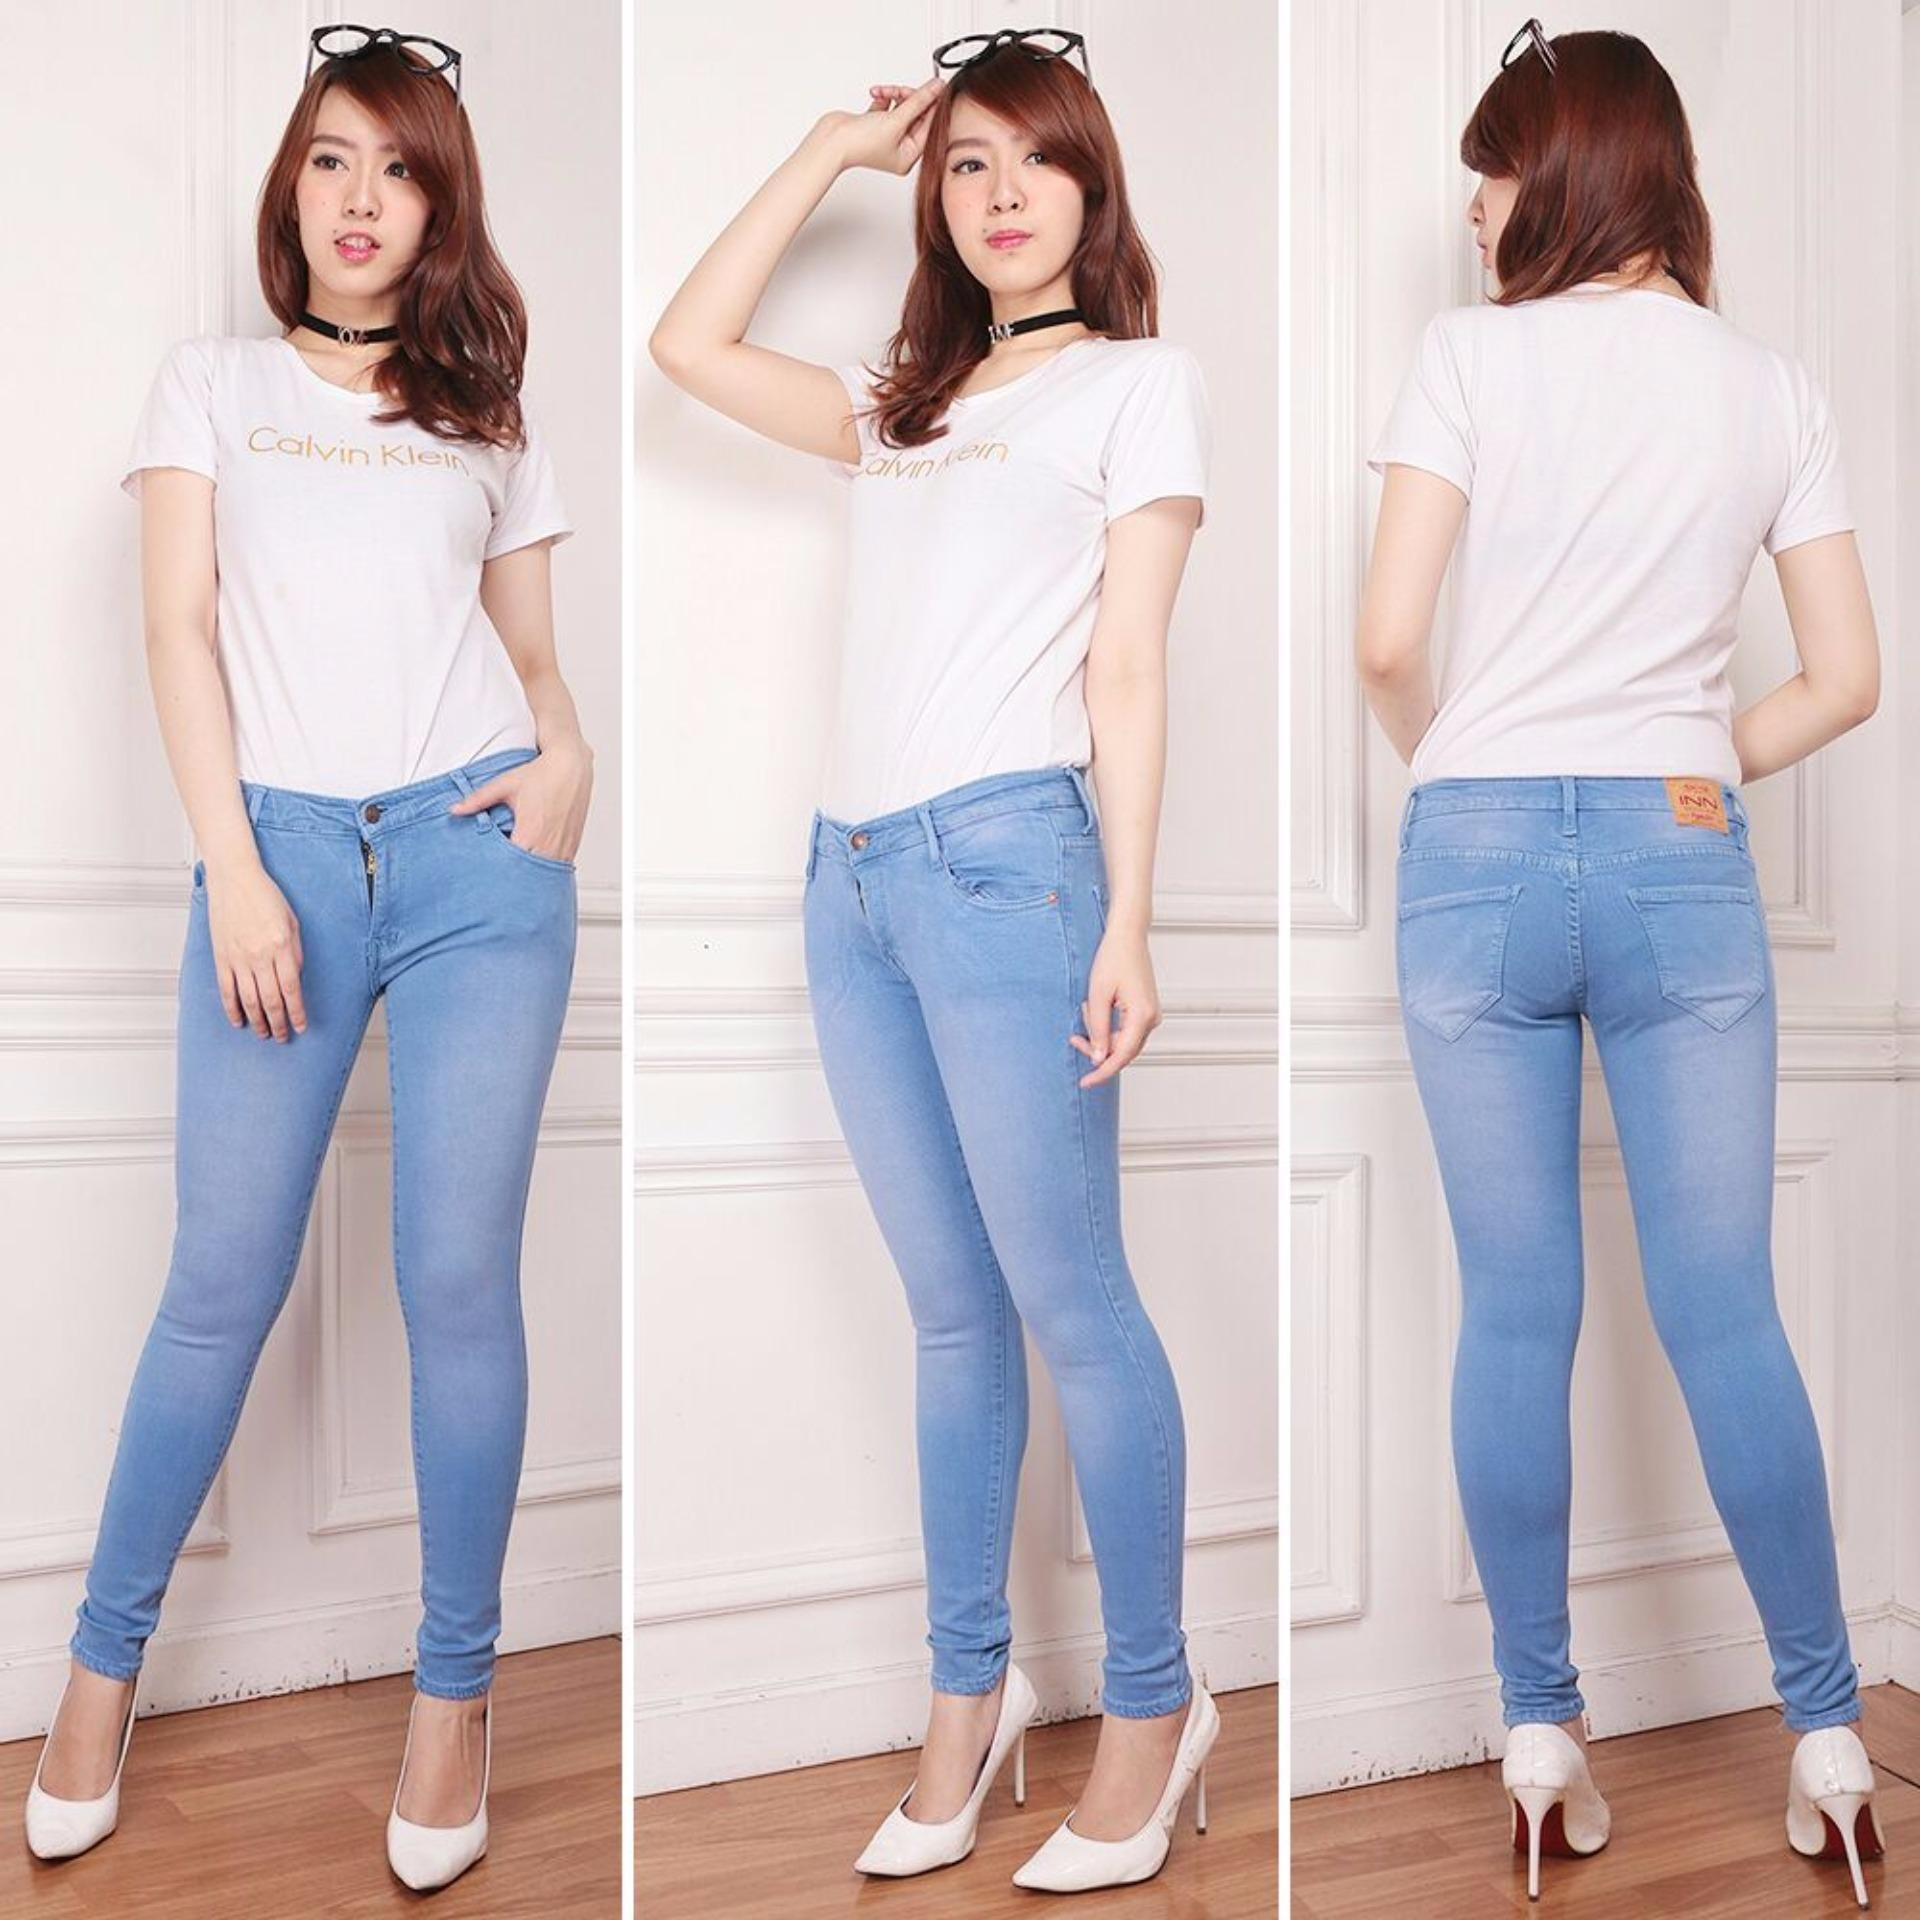 Daftar Harga Nusantara Jeans Celana Panjang Wanita Model Skinny Street Berbahan Denim Bagus Jahitan Rapi Murah Ice Blue Nusantara Jeans1